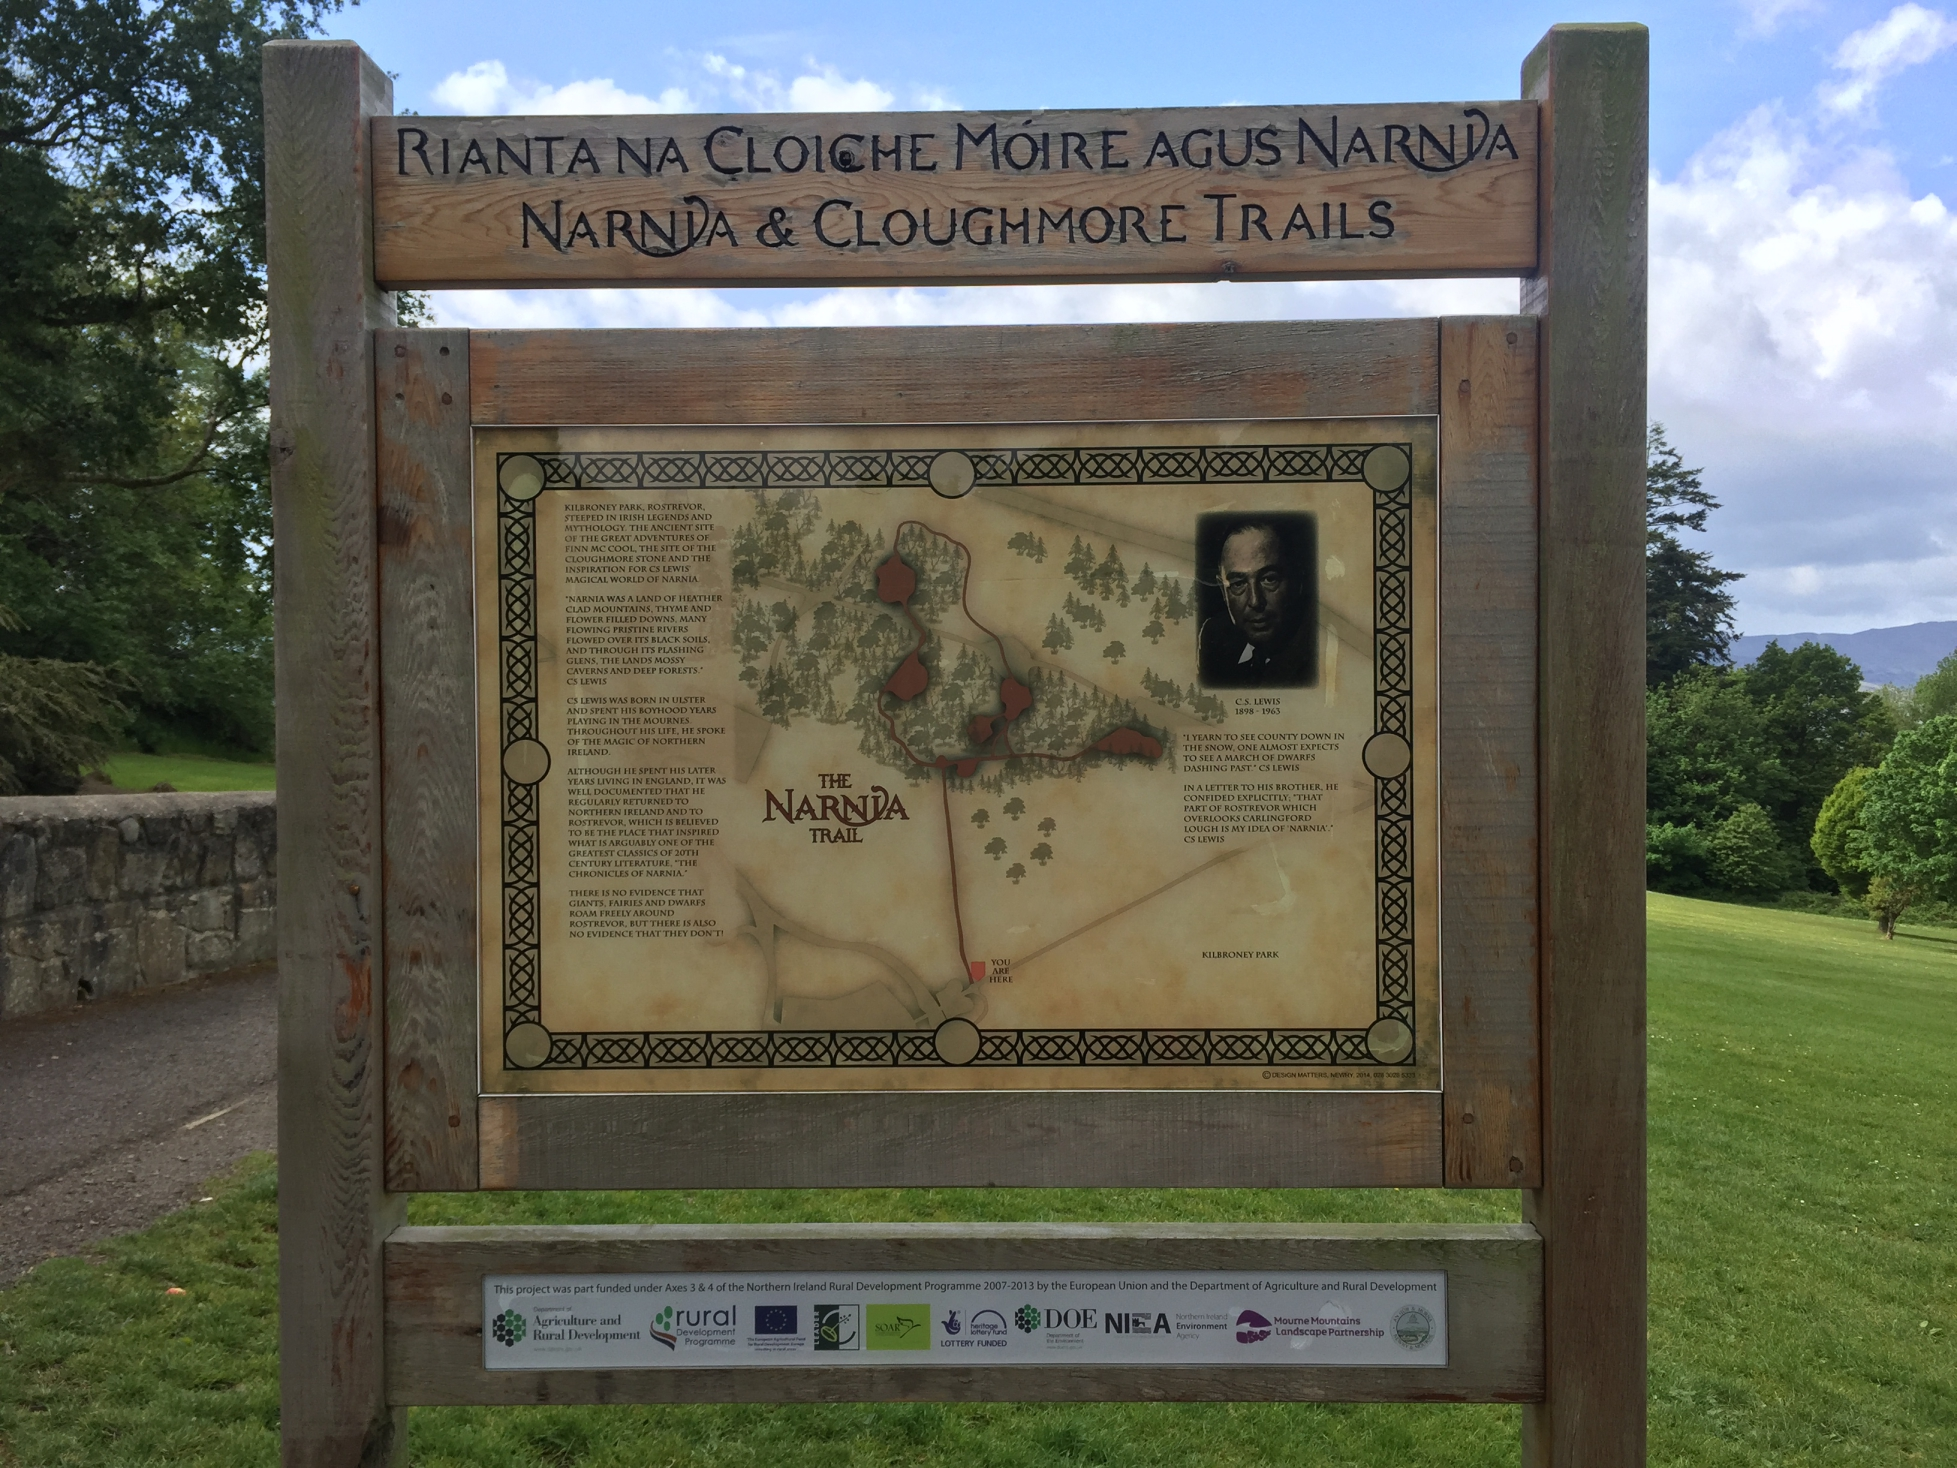 mini_countryman_david_prentice_niexplorer_ni_explorer_northern_ireland